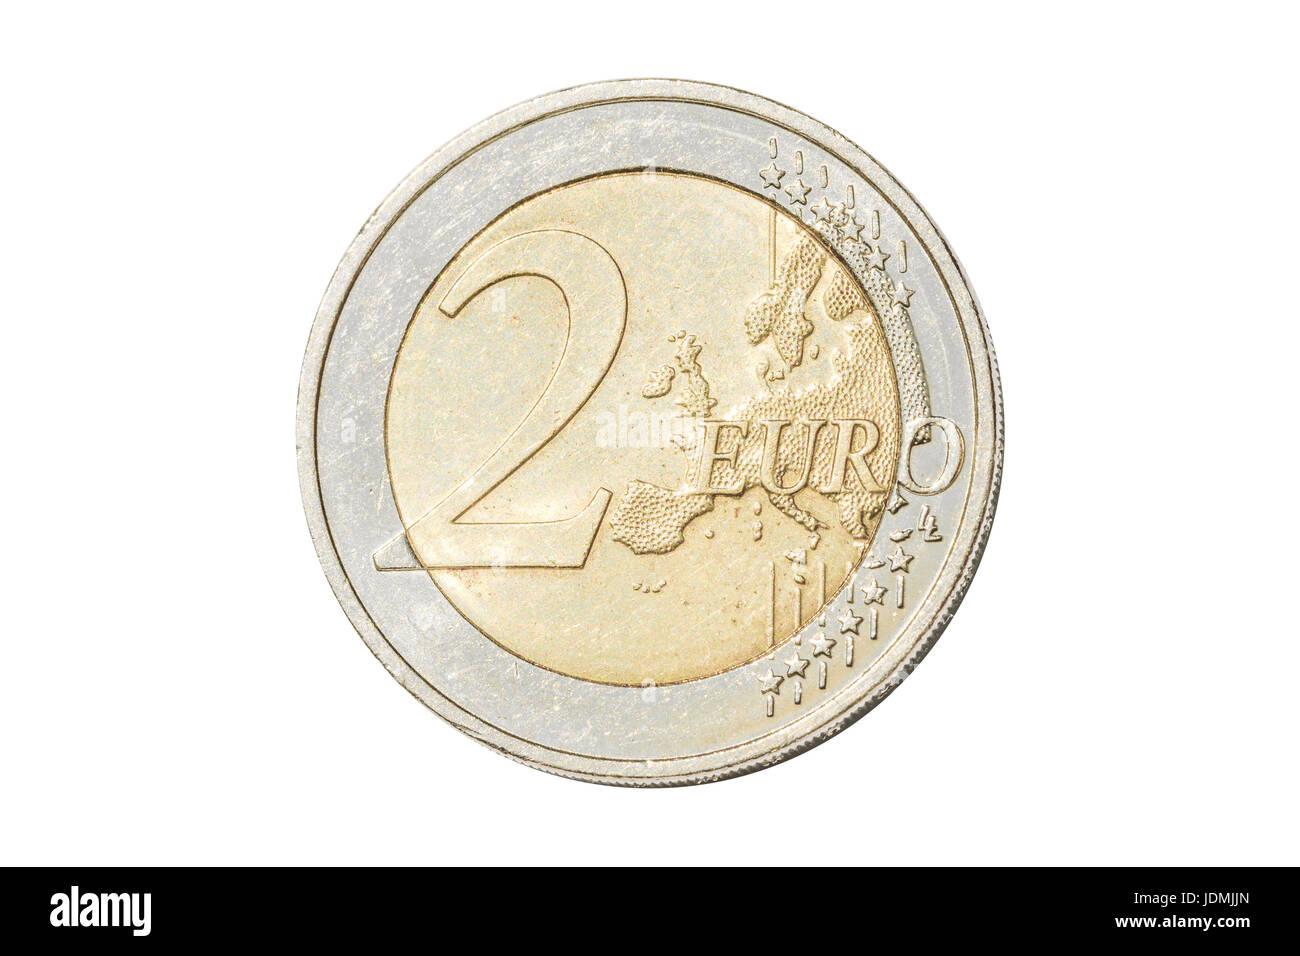 Zwei Euro Münze Stockfotos Zwei Euro Münze Bilder Seite 2 Alamy